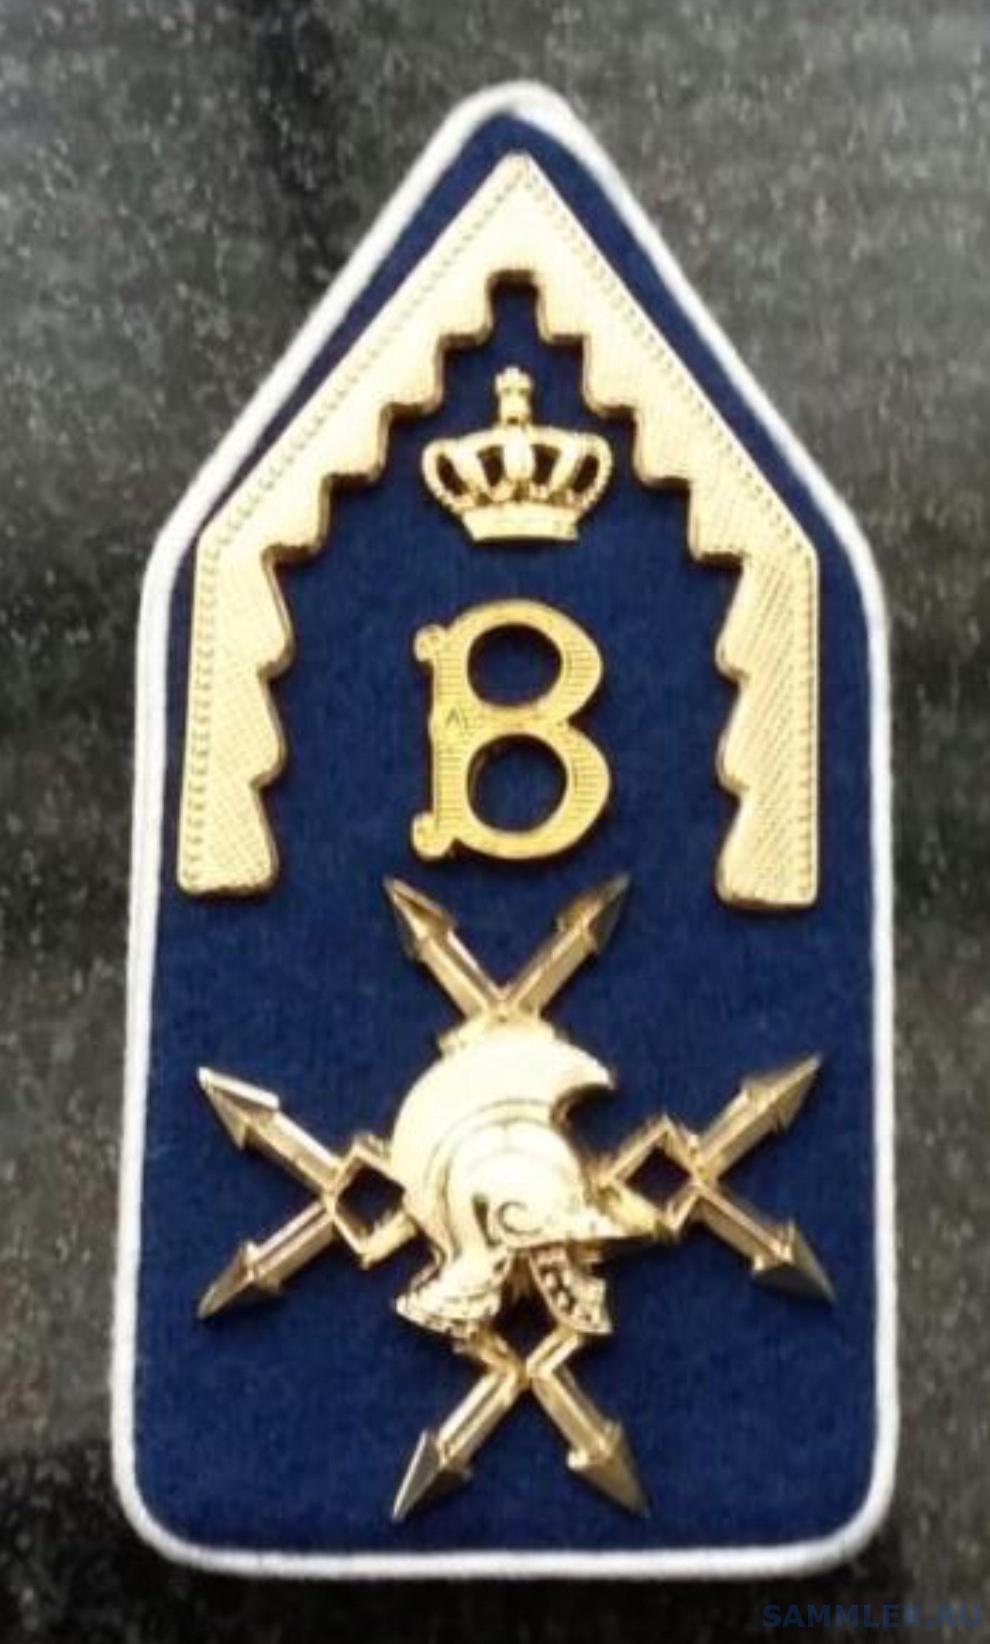 F6B258C6-2E07-43CF-887B-D9B3062C6BE8.jpeg